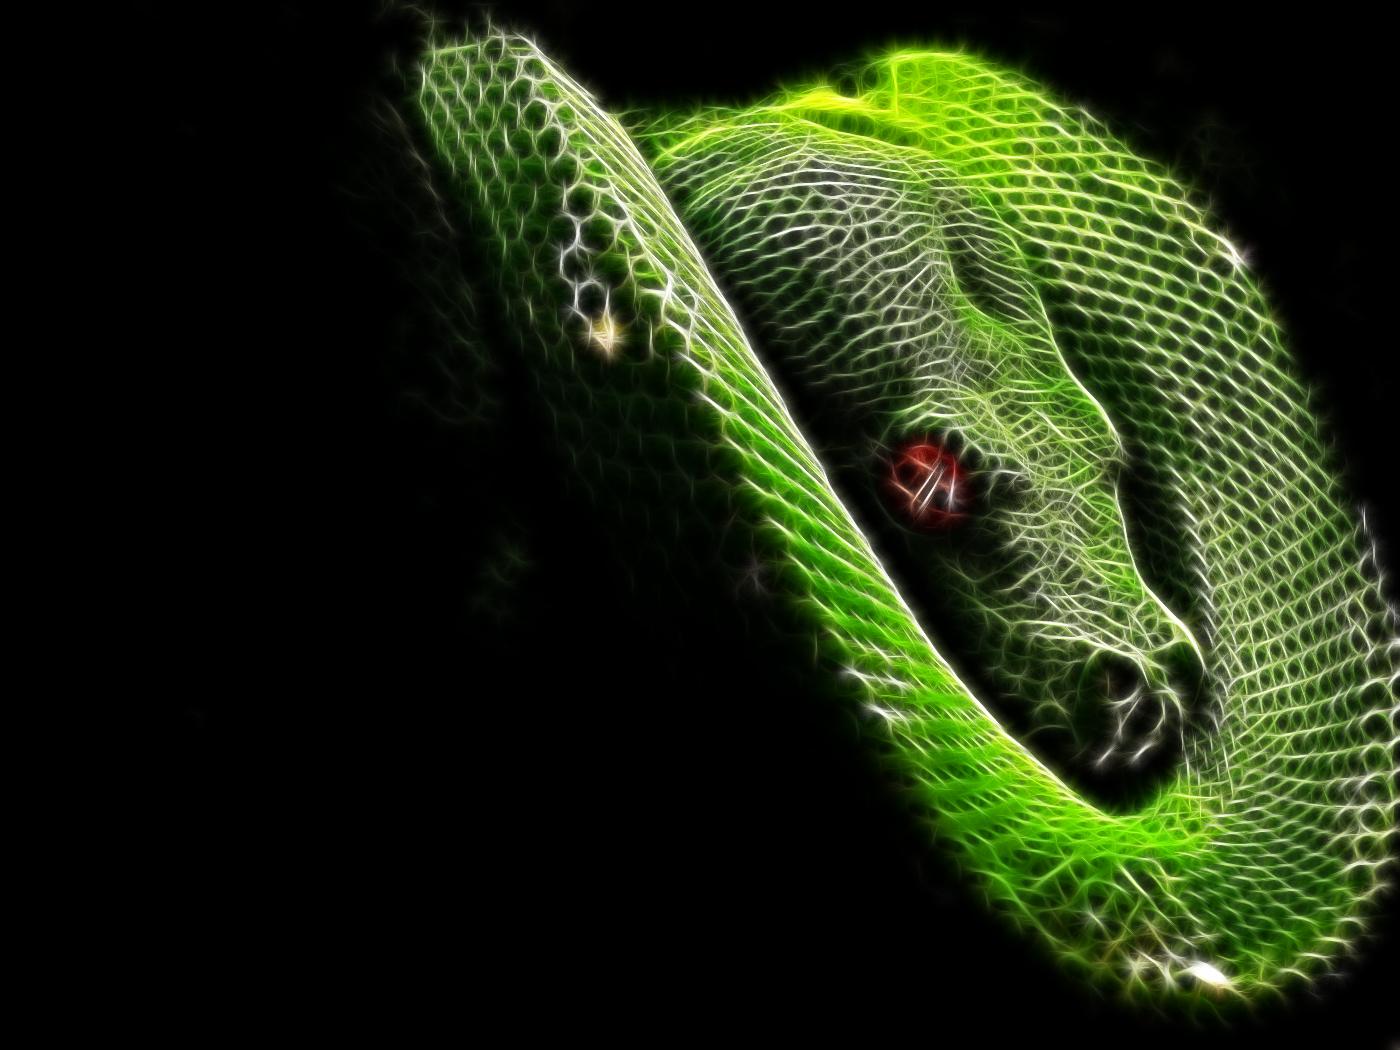 moving snake wallpaper wallpapersafari